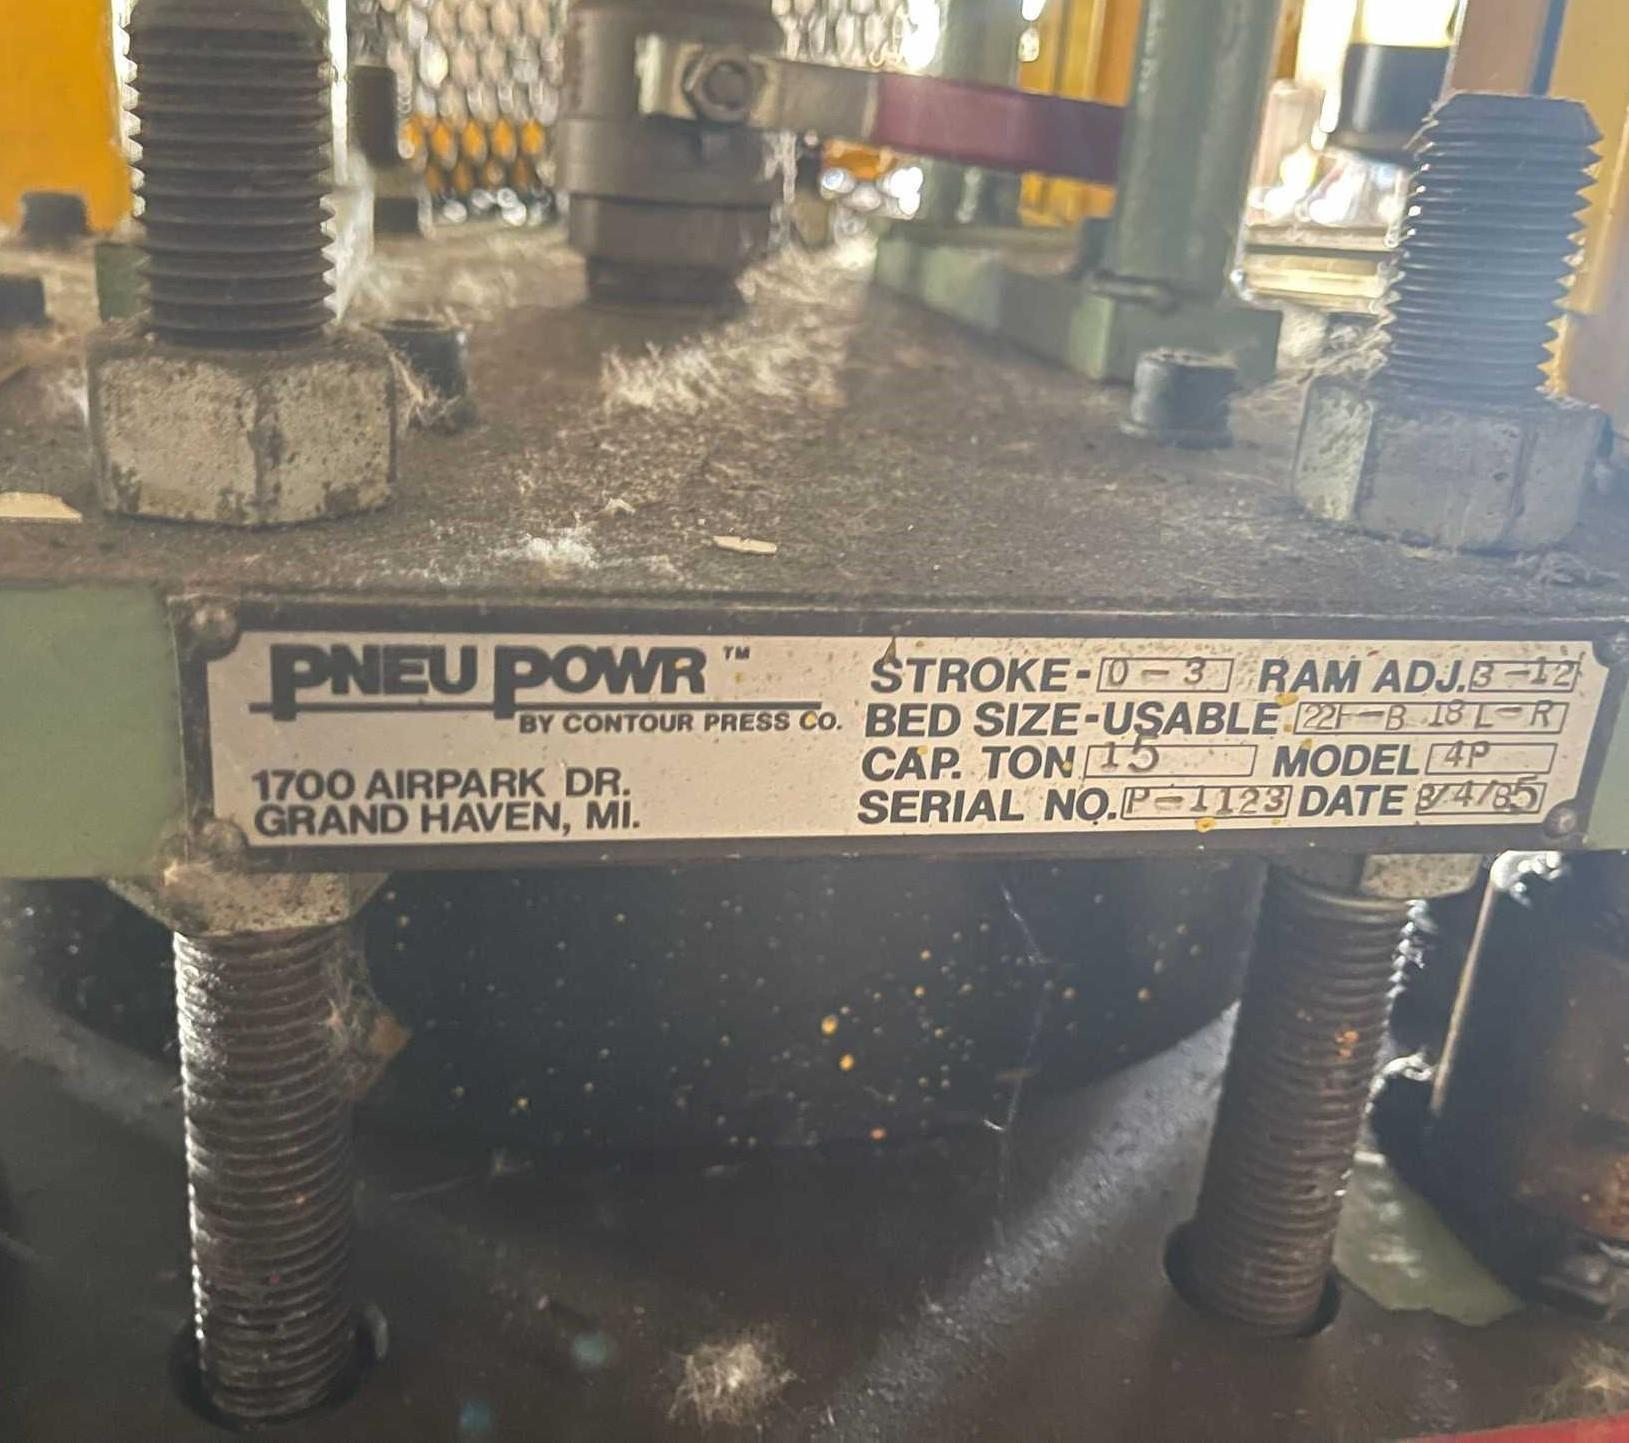 15 TON PNEU POWER PNEUMATIC CUT OFF PRESS. STOCK # 0957421